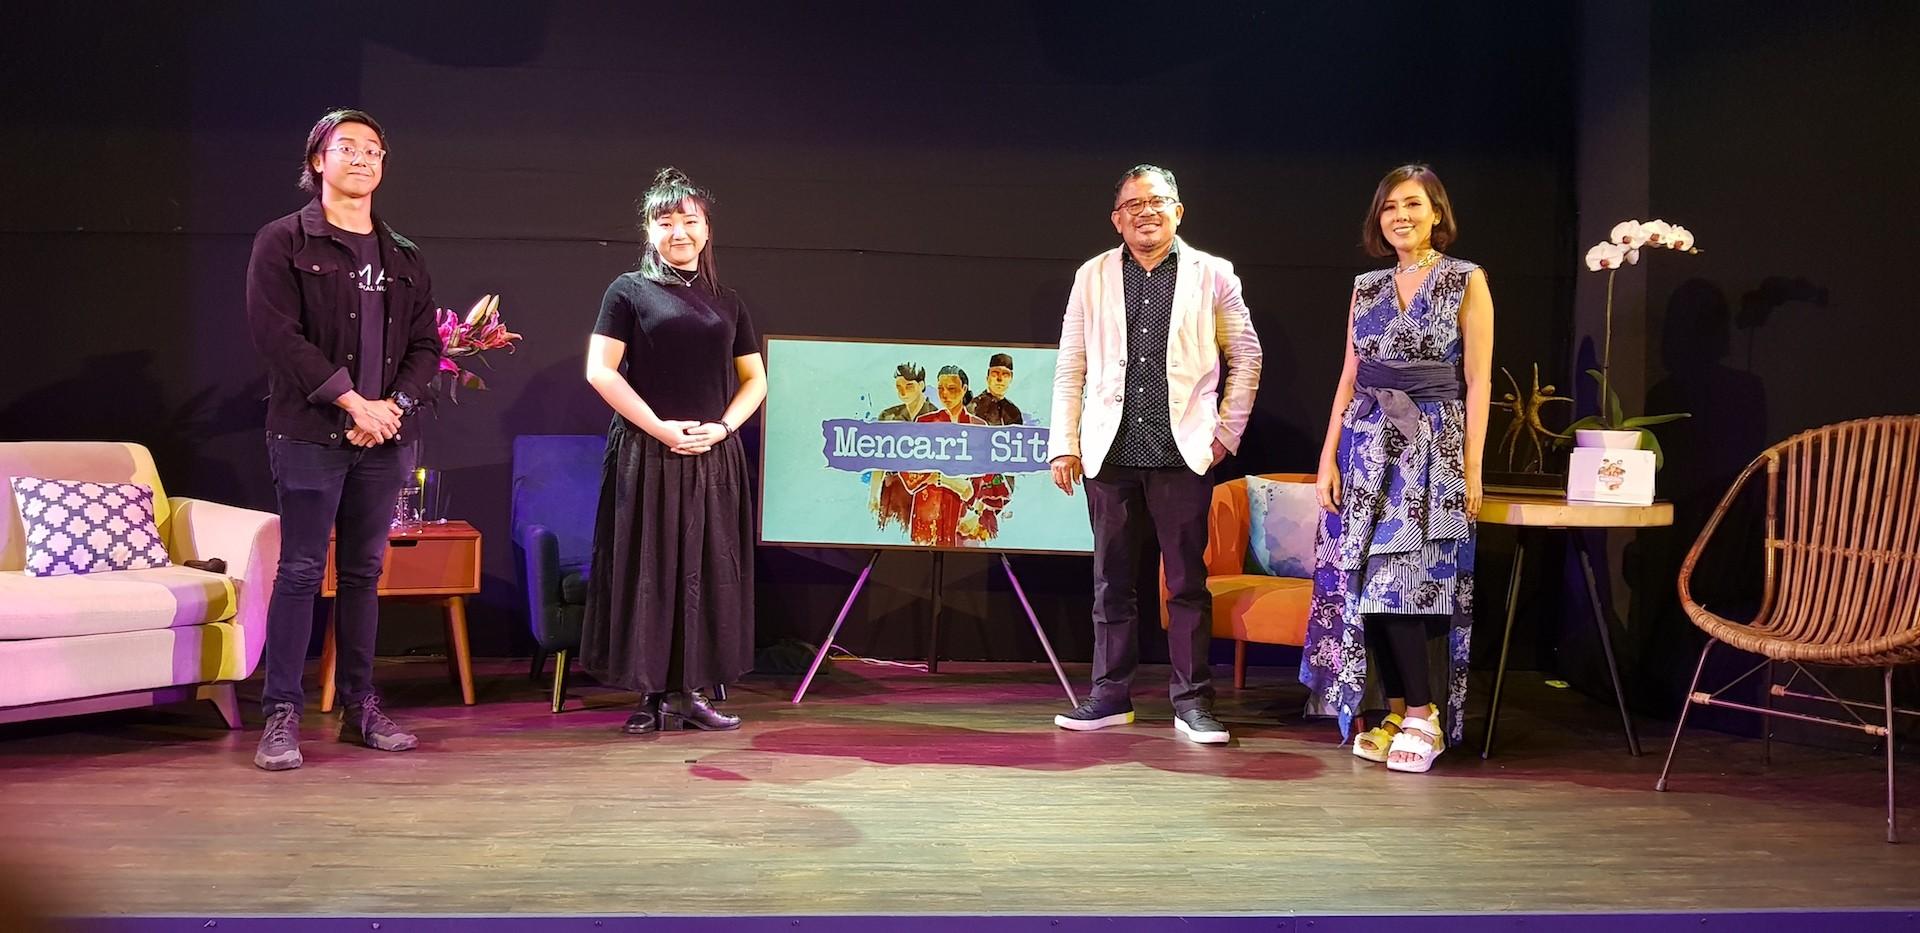 Mencari Siti: Behind The Scene